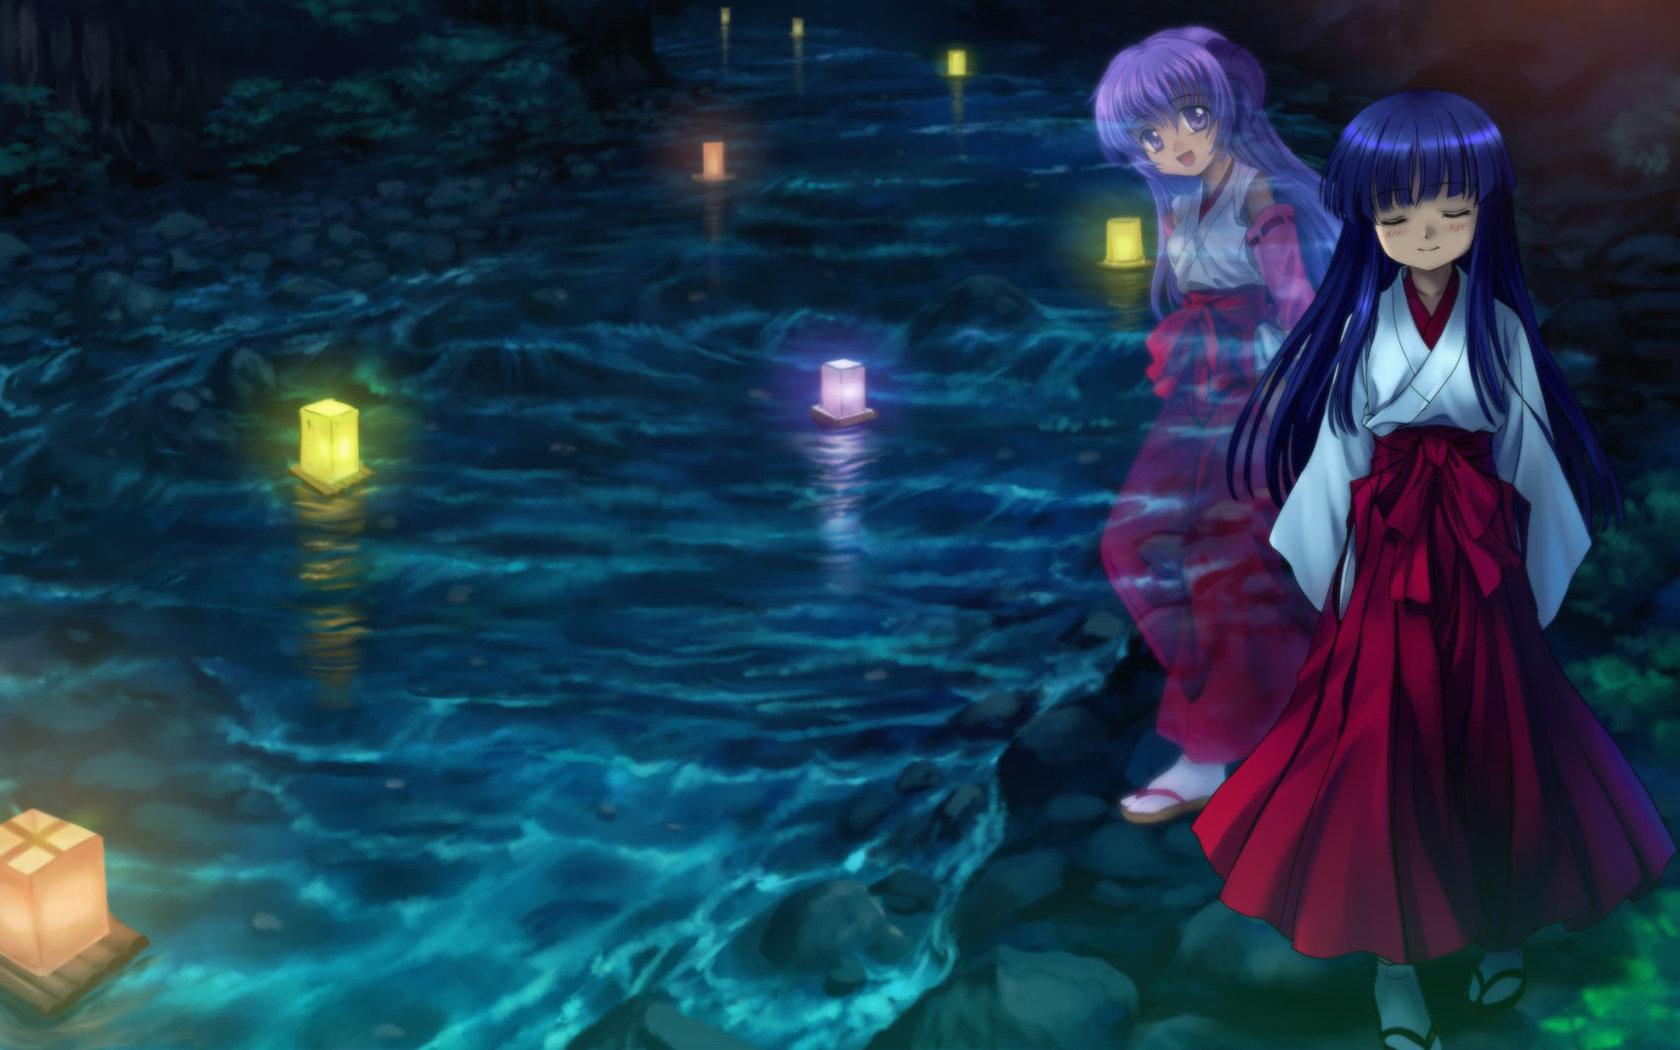 Download Hd 1680x1050 When They Cry Higurashi No Naku Koro Ni Desktop Background Id 160330 For